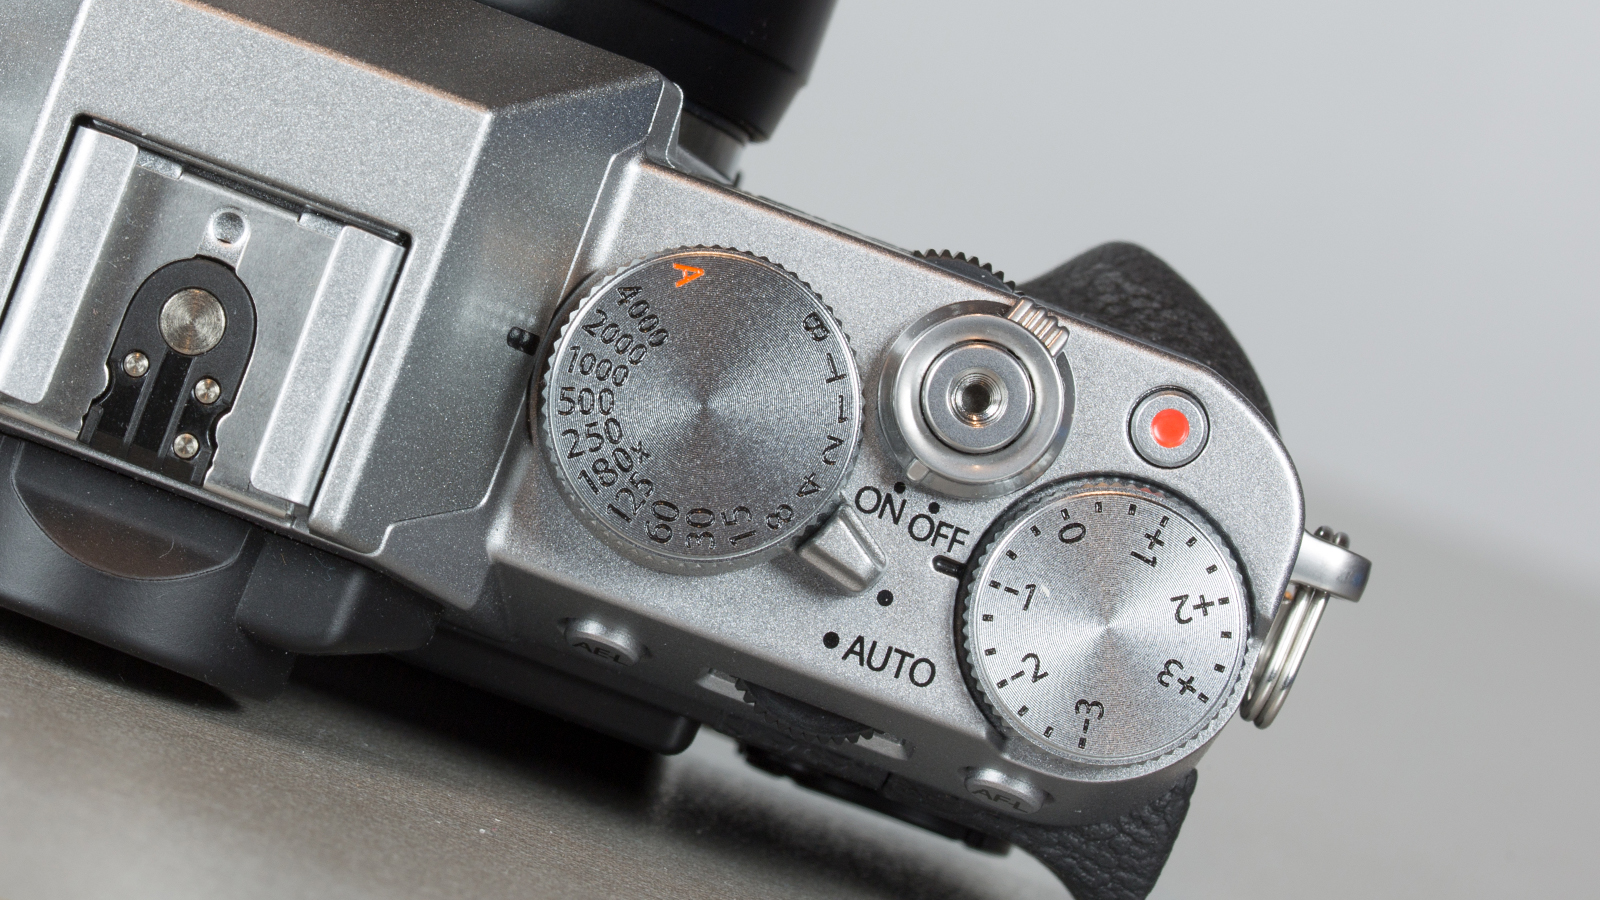 Fujifilm-X-T10-DT-006-pealt2